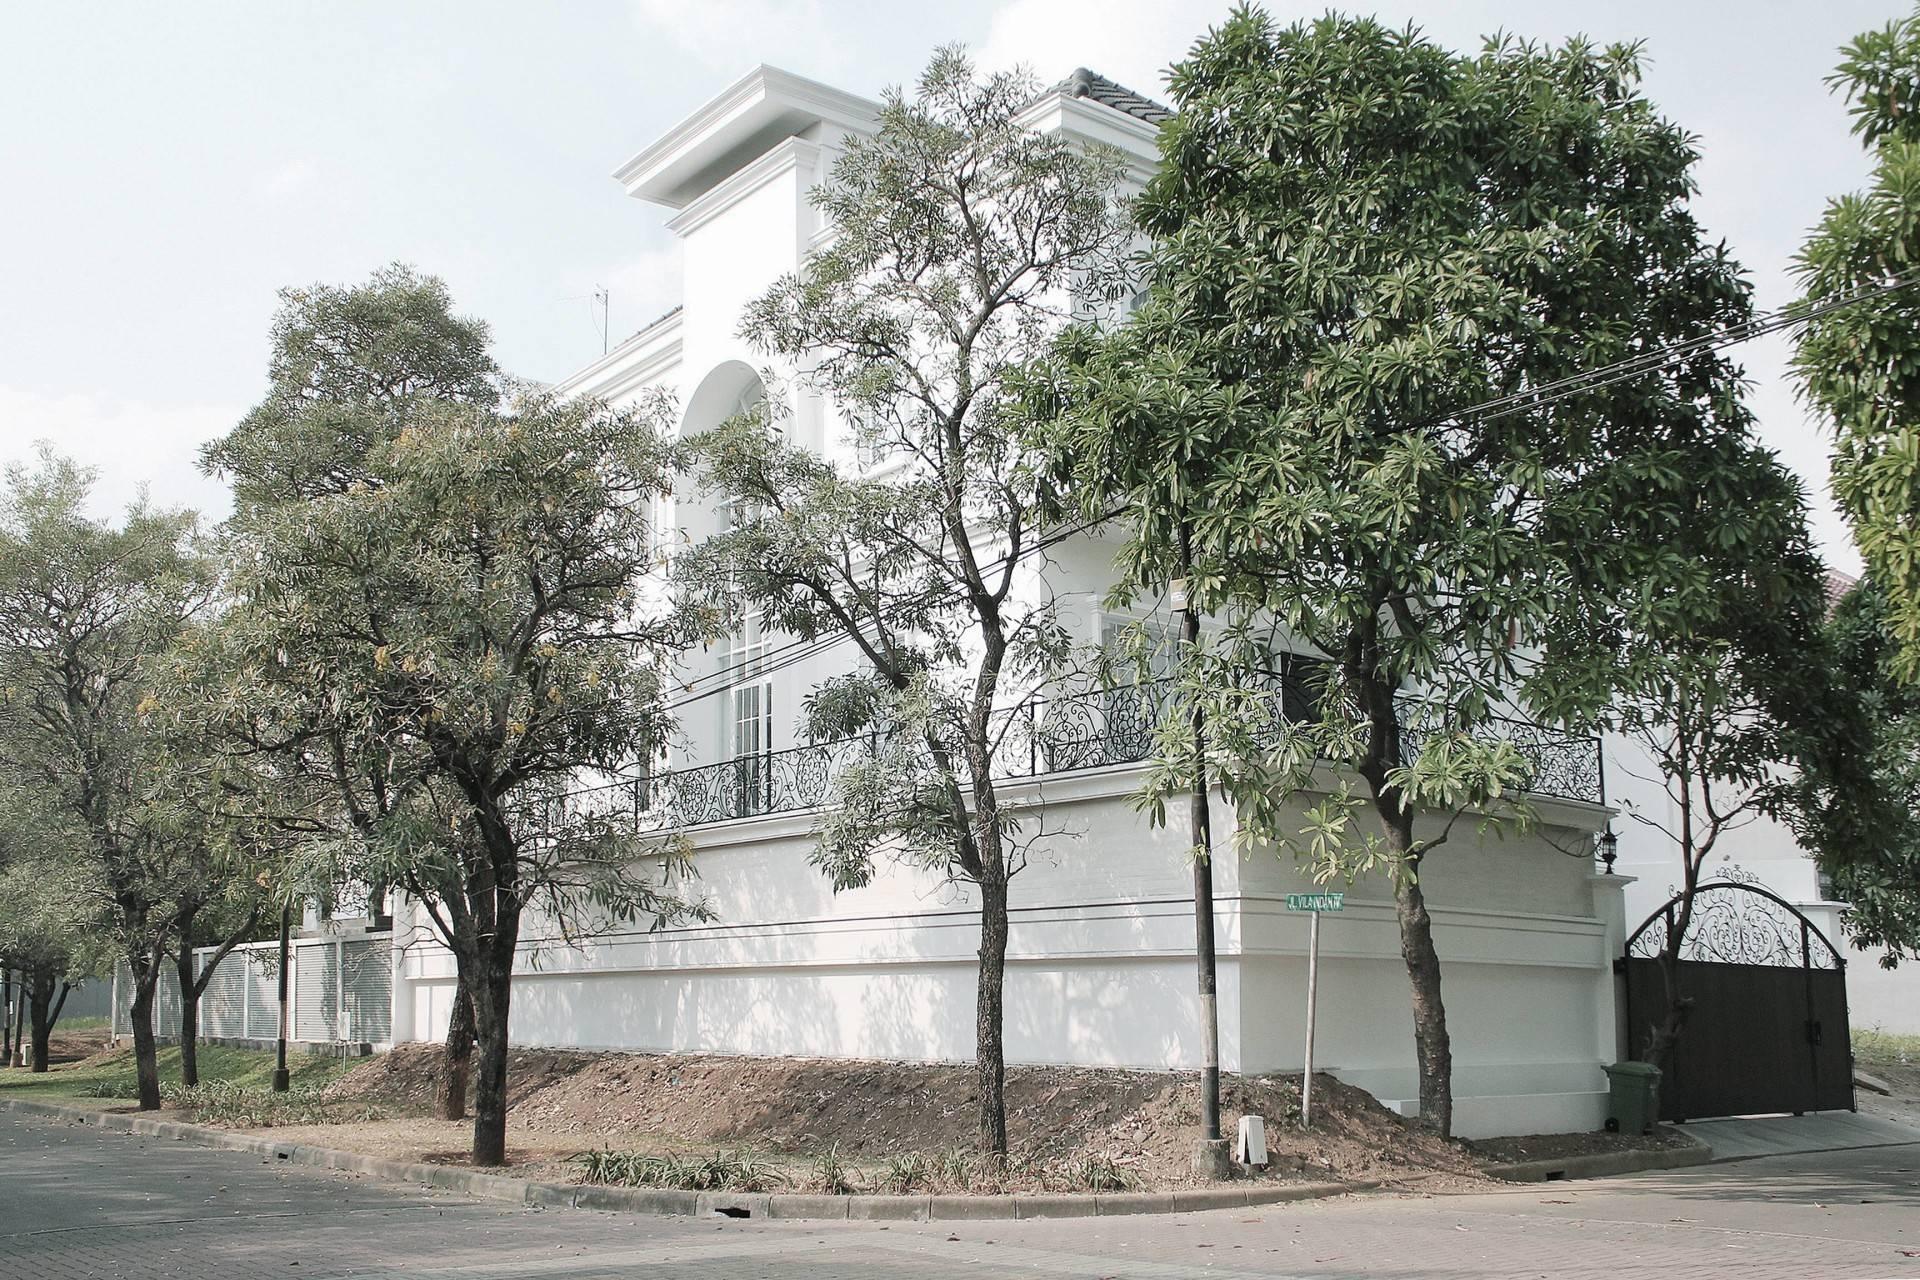 Studio Rtm He-House Villa Pondok Indah Villa Pondok Indah Facade   3799